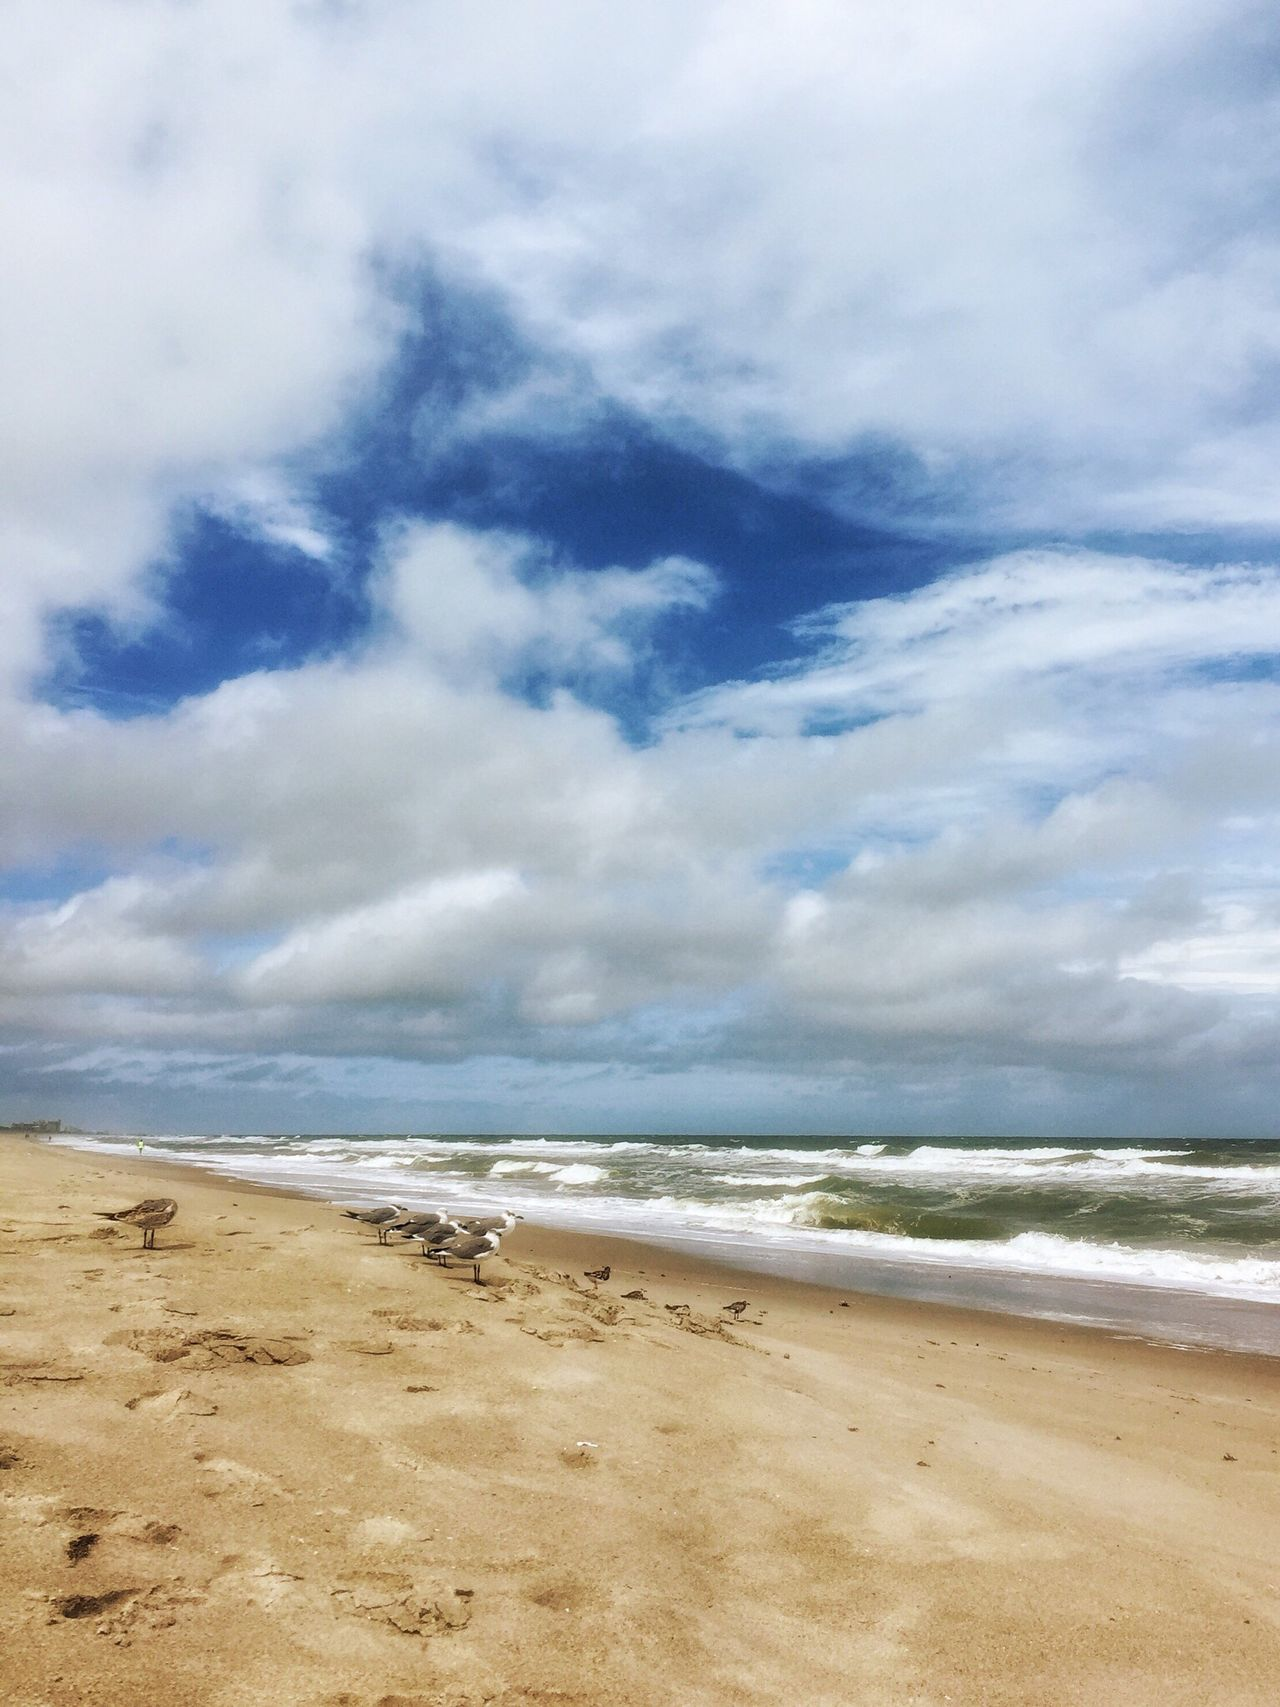 Shore birds Tranquil Scene Horizon Over Water Seascape Melbourne Beach, FL Oceanscape Cloud - Sky Beach Storm Clouds Windy Day Seagulls Shore Birds